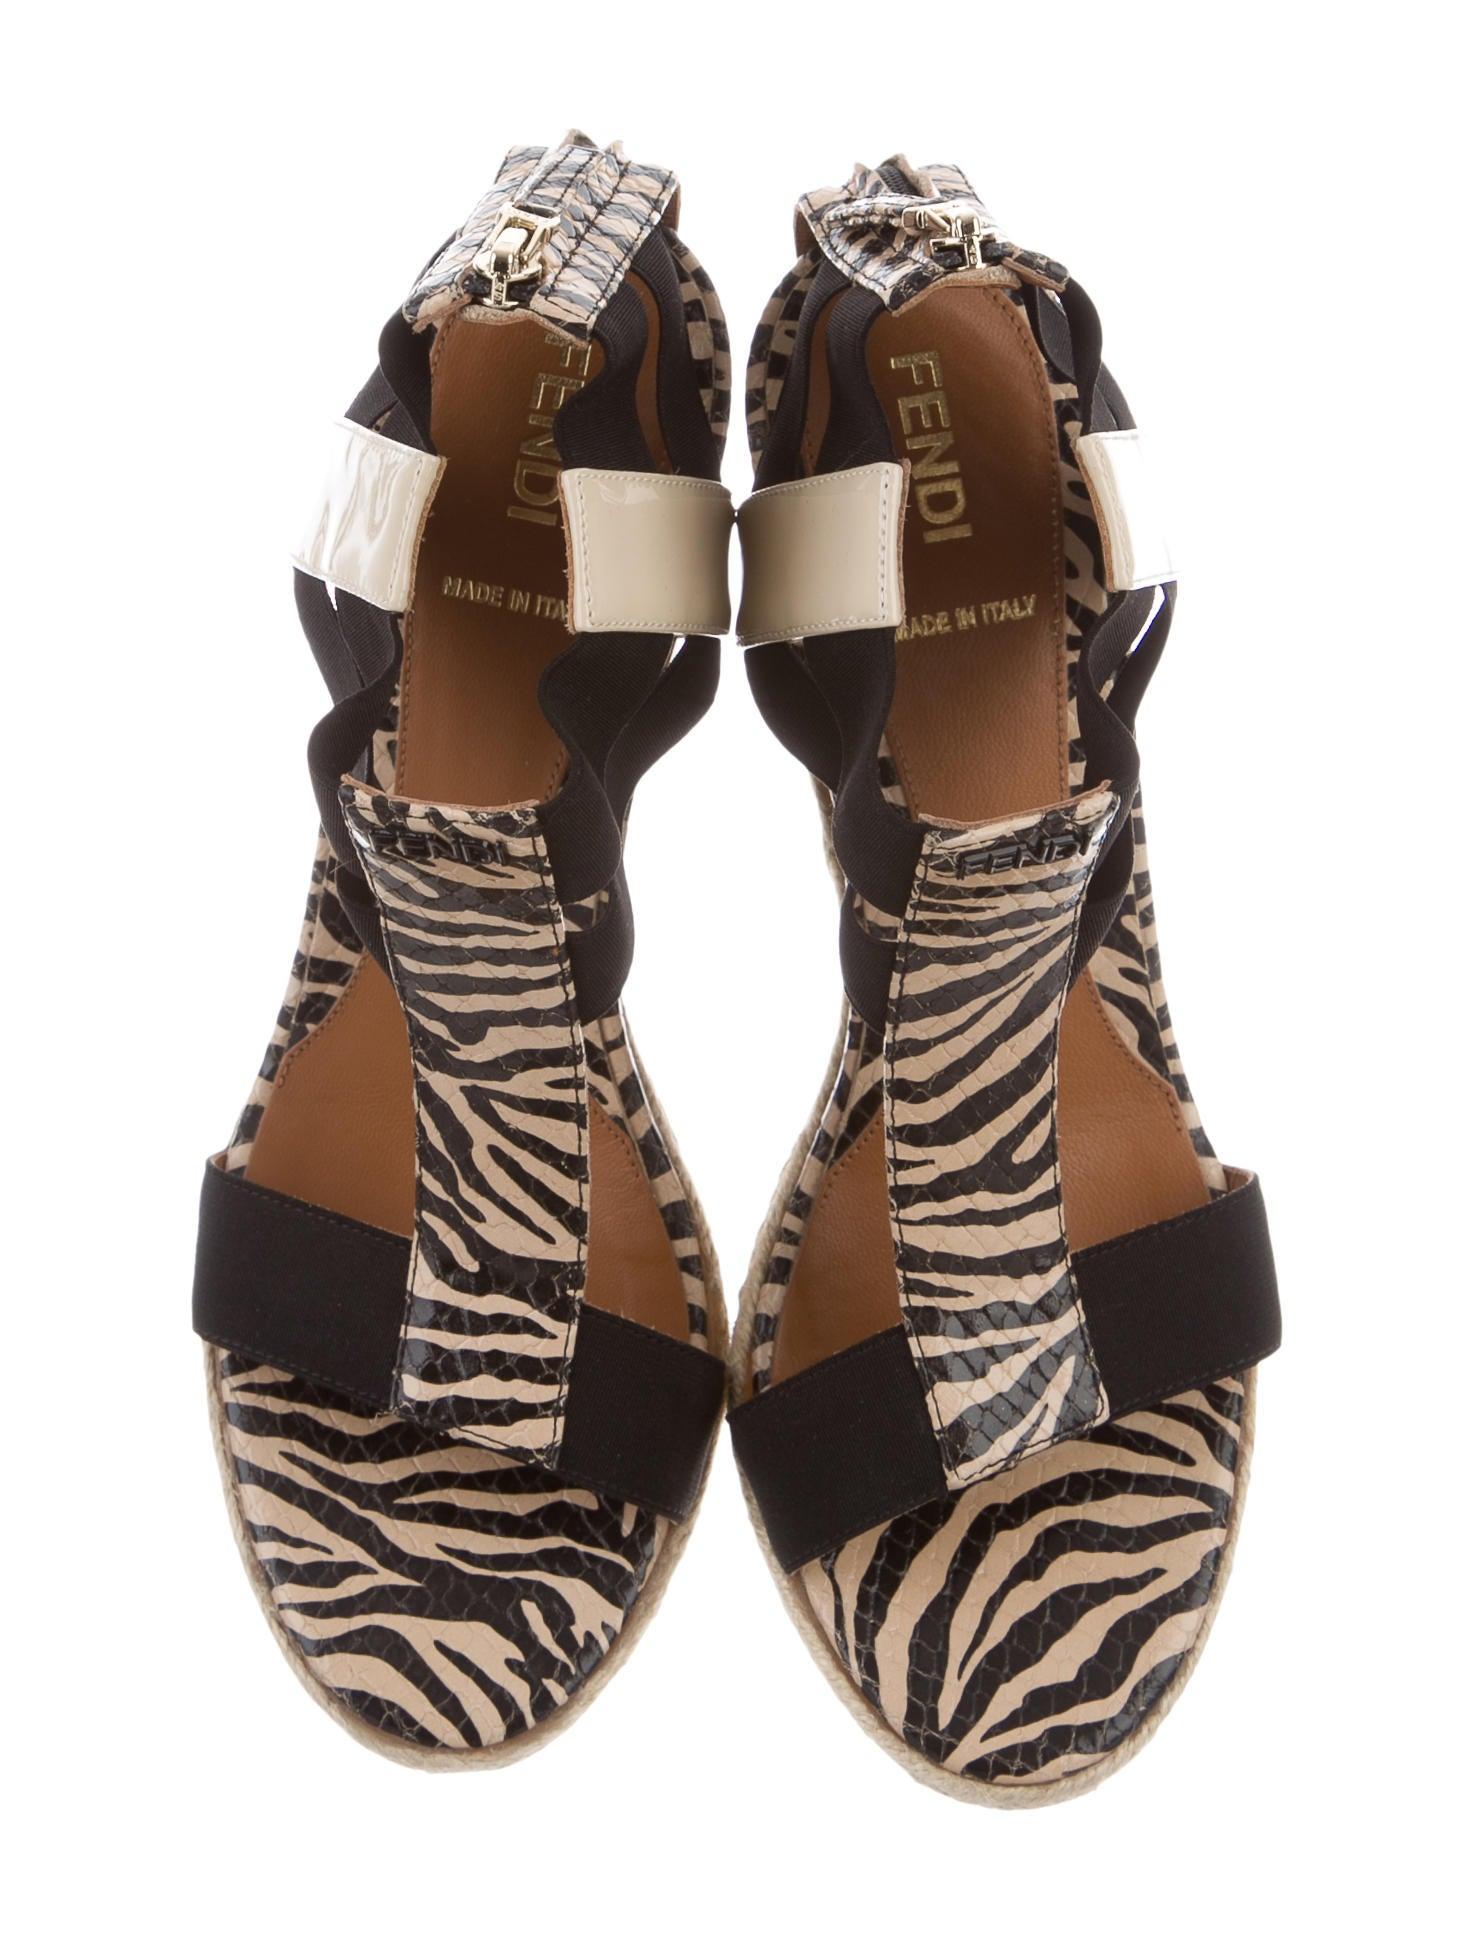 fendi zebra print wedge sandals shoes fen52552 the